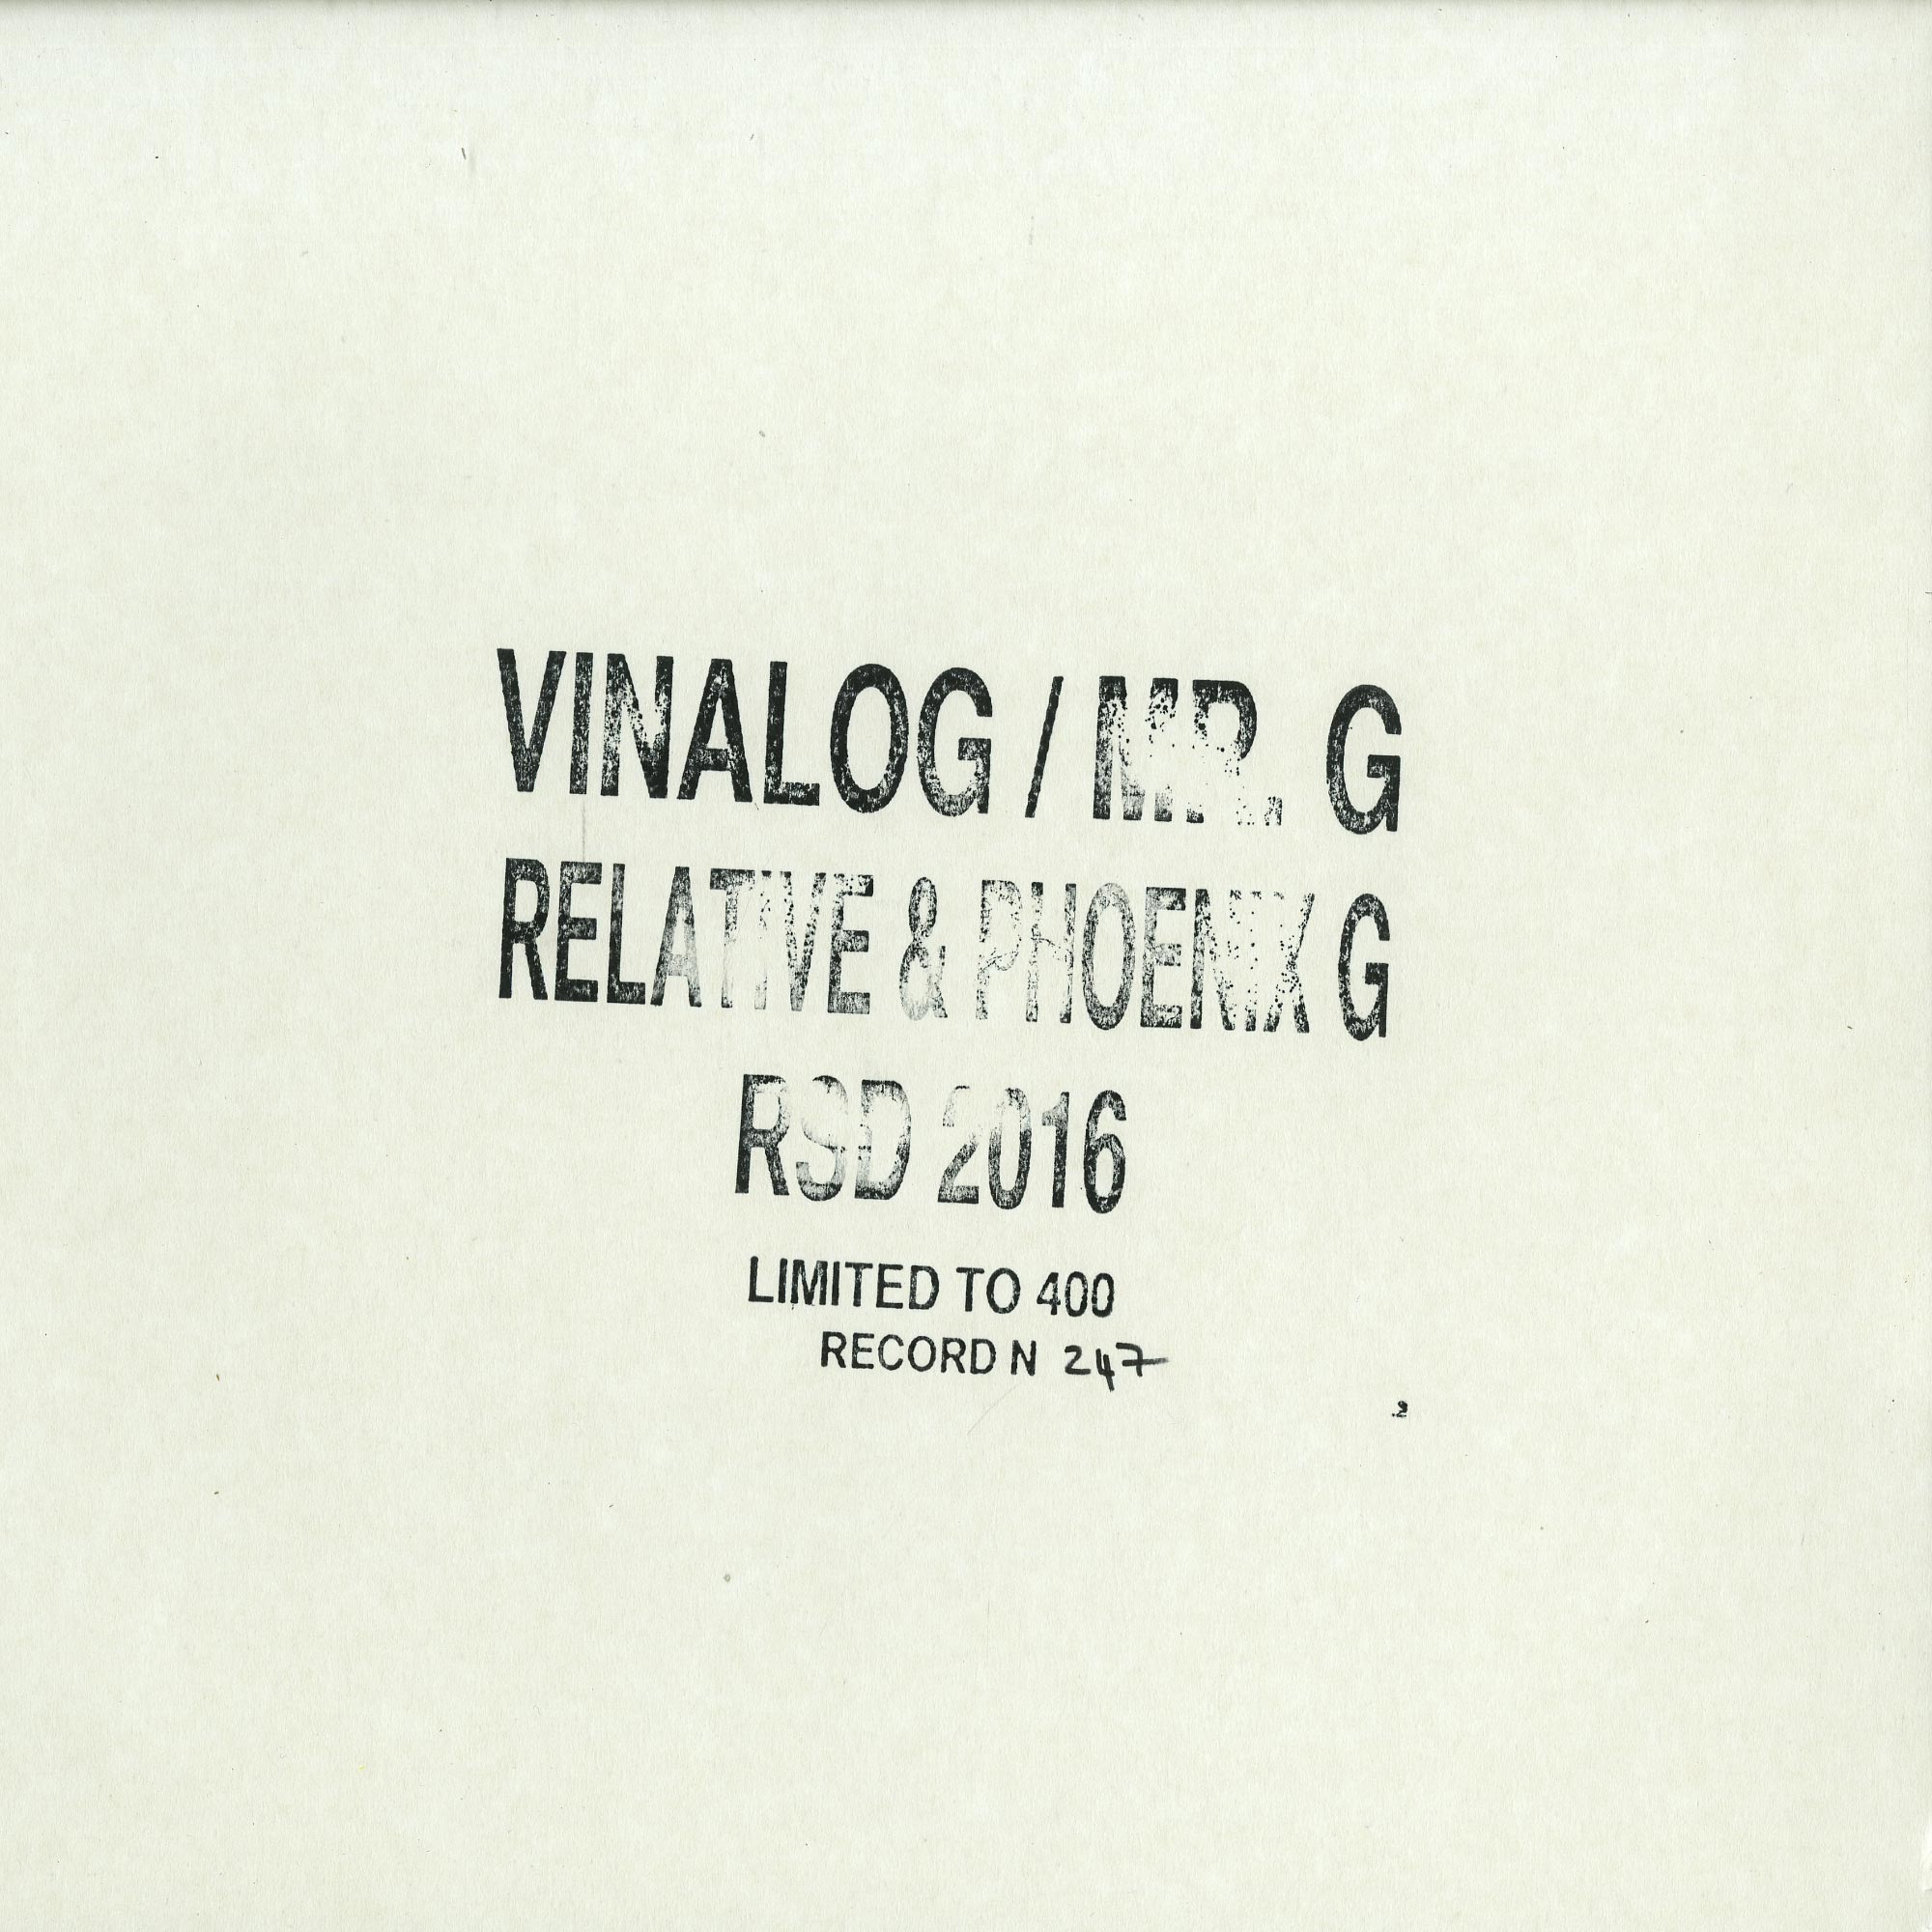 Vinalog / Mr. G - RELATIVE & PHOENIX G 004